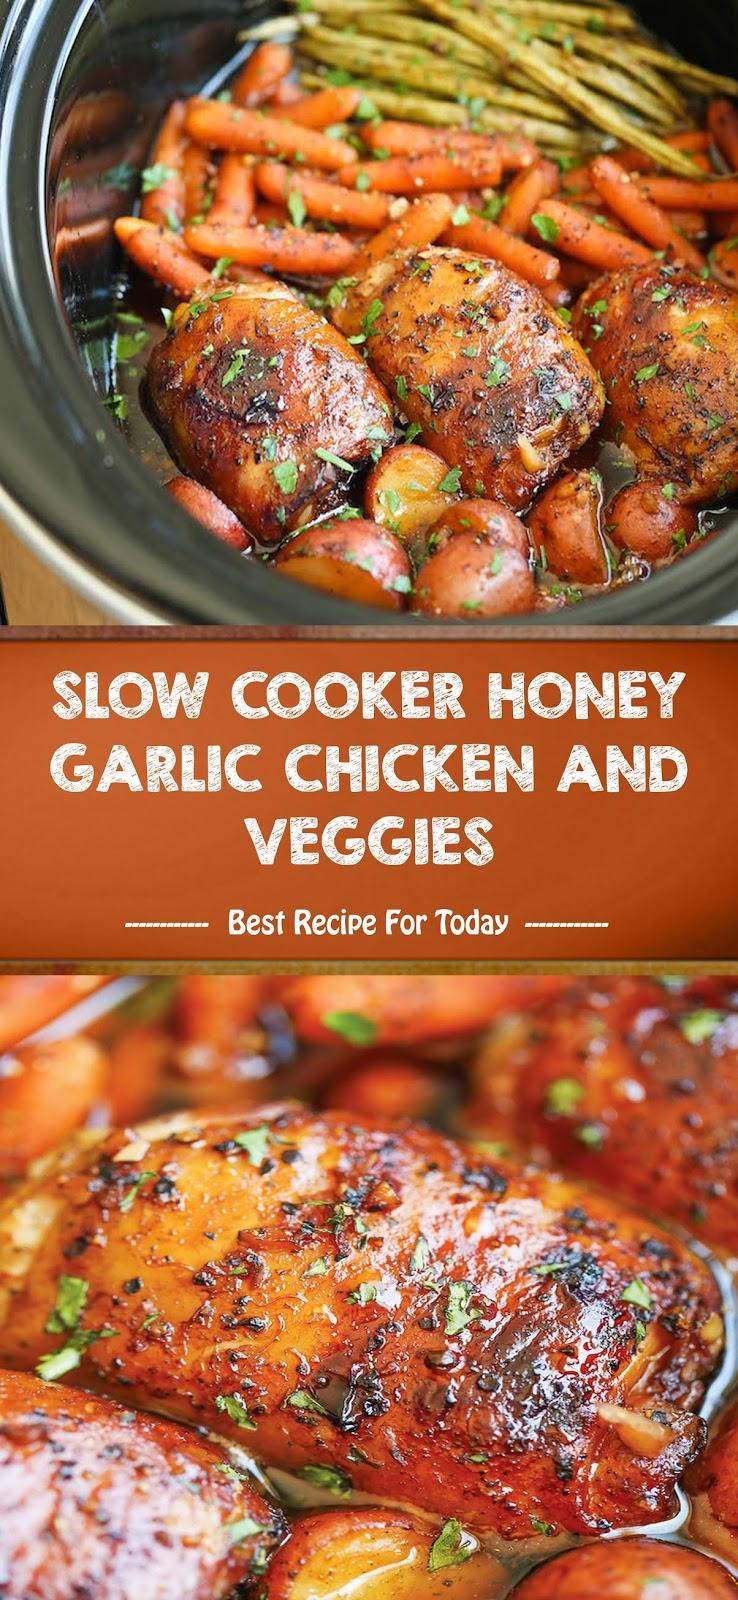 Slow Cooker Honey Garlic Chicken And Veggies Aneka Resep Minuman Chicken Recipes Boneless Chicken Crockpot Recipes Healthy Chicken Crockpot Recipes